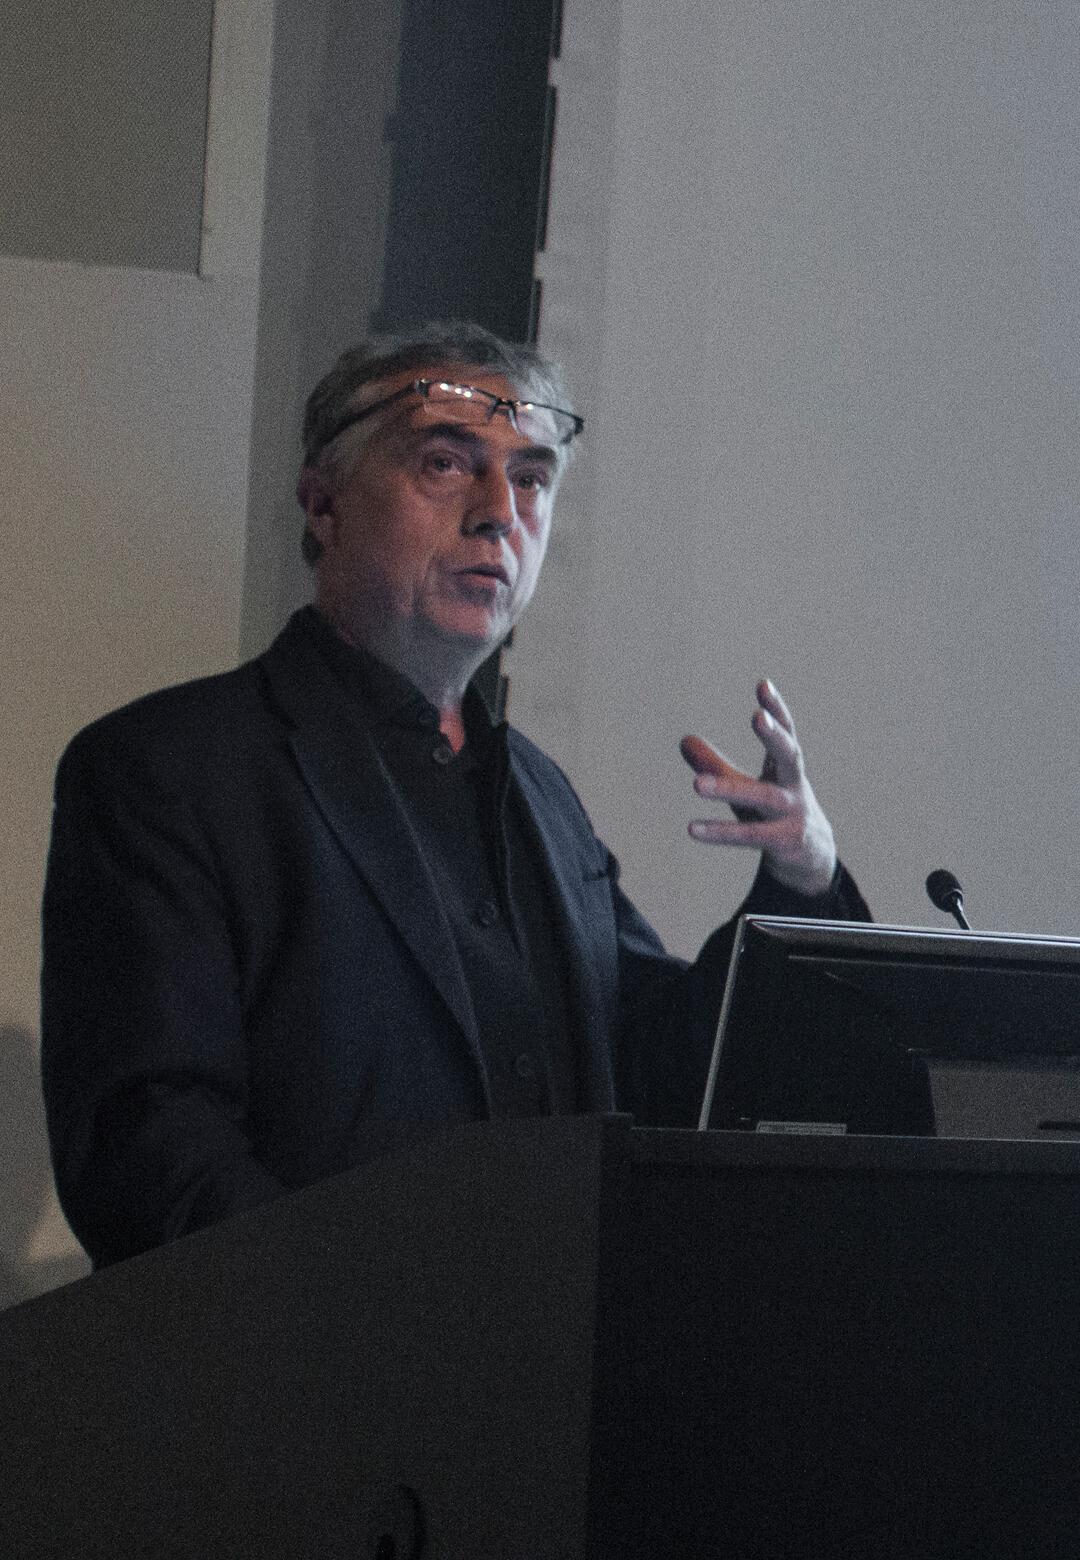 Italian architect and urban planner Stefano Boeri has been announced as curator for Salone del Mobile 2021 | STIRworld